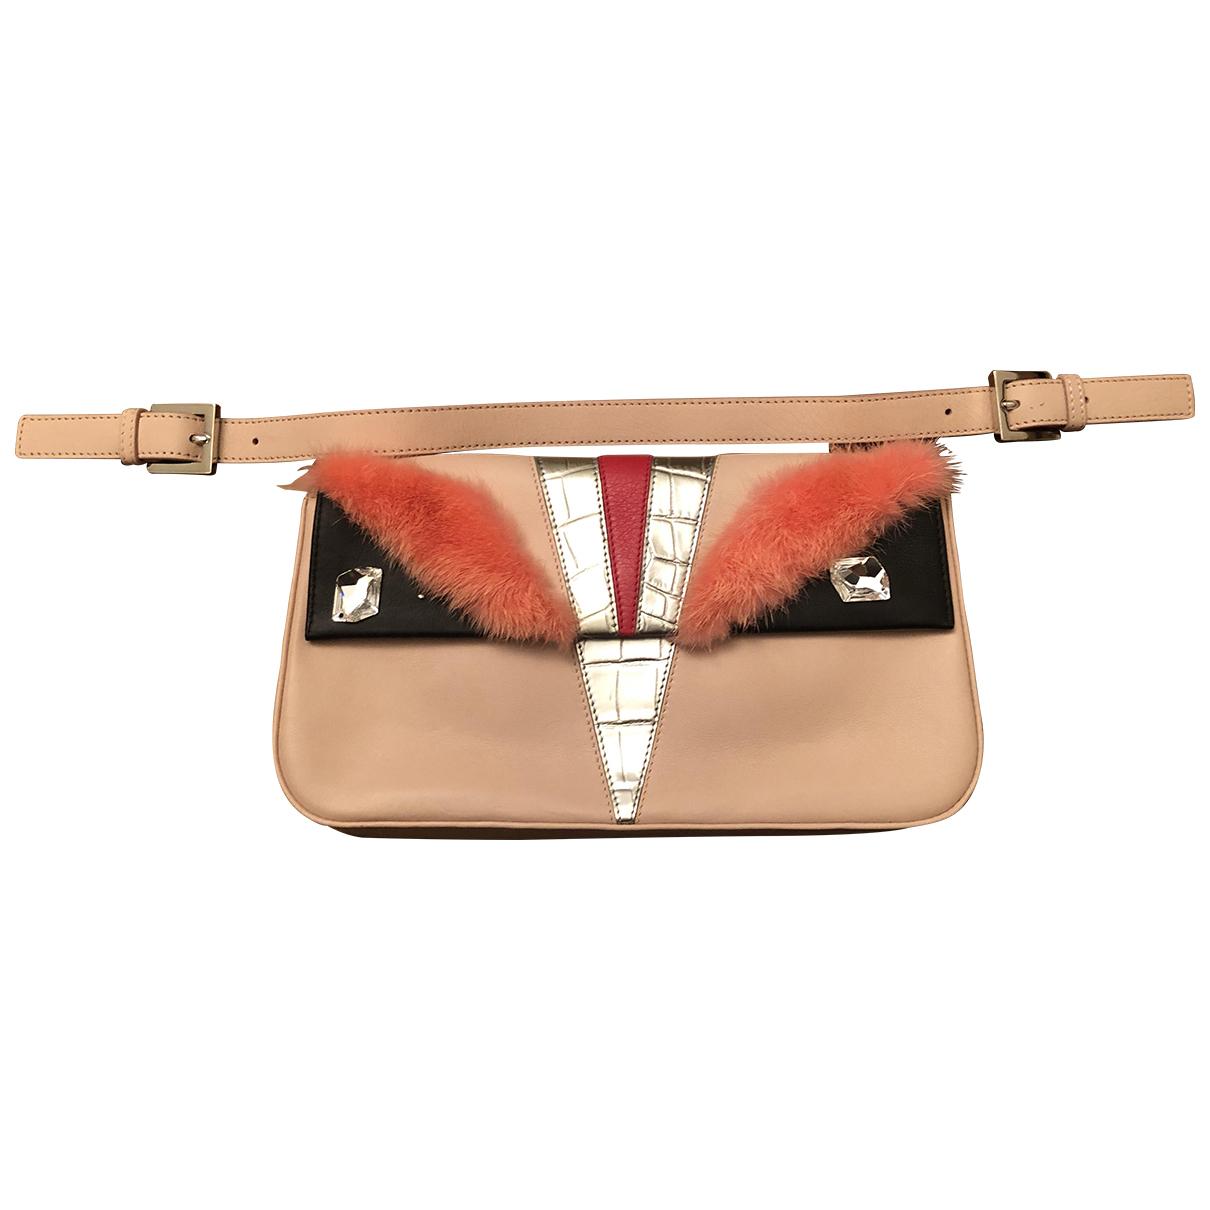 Fendi N Pink Leather Clutch bag for Women N